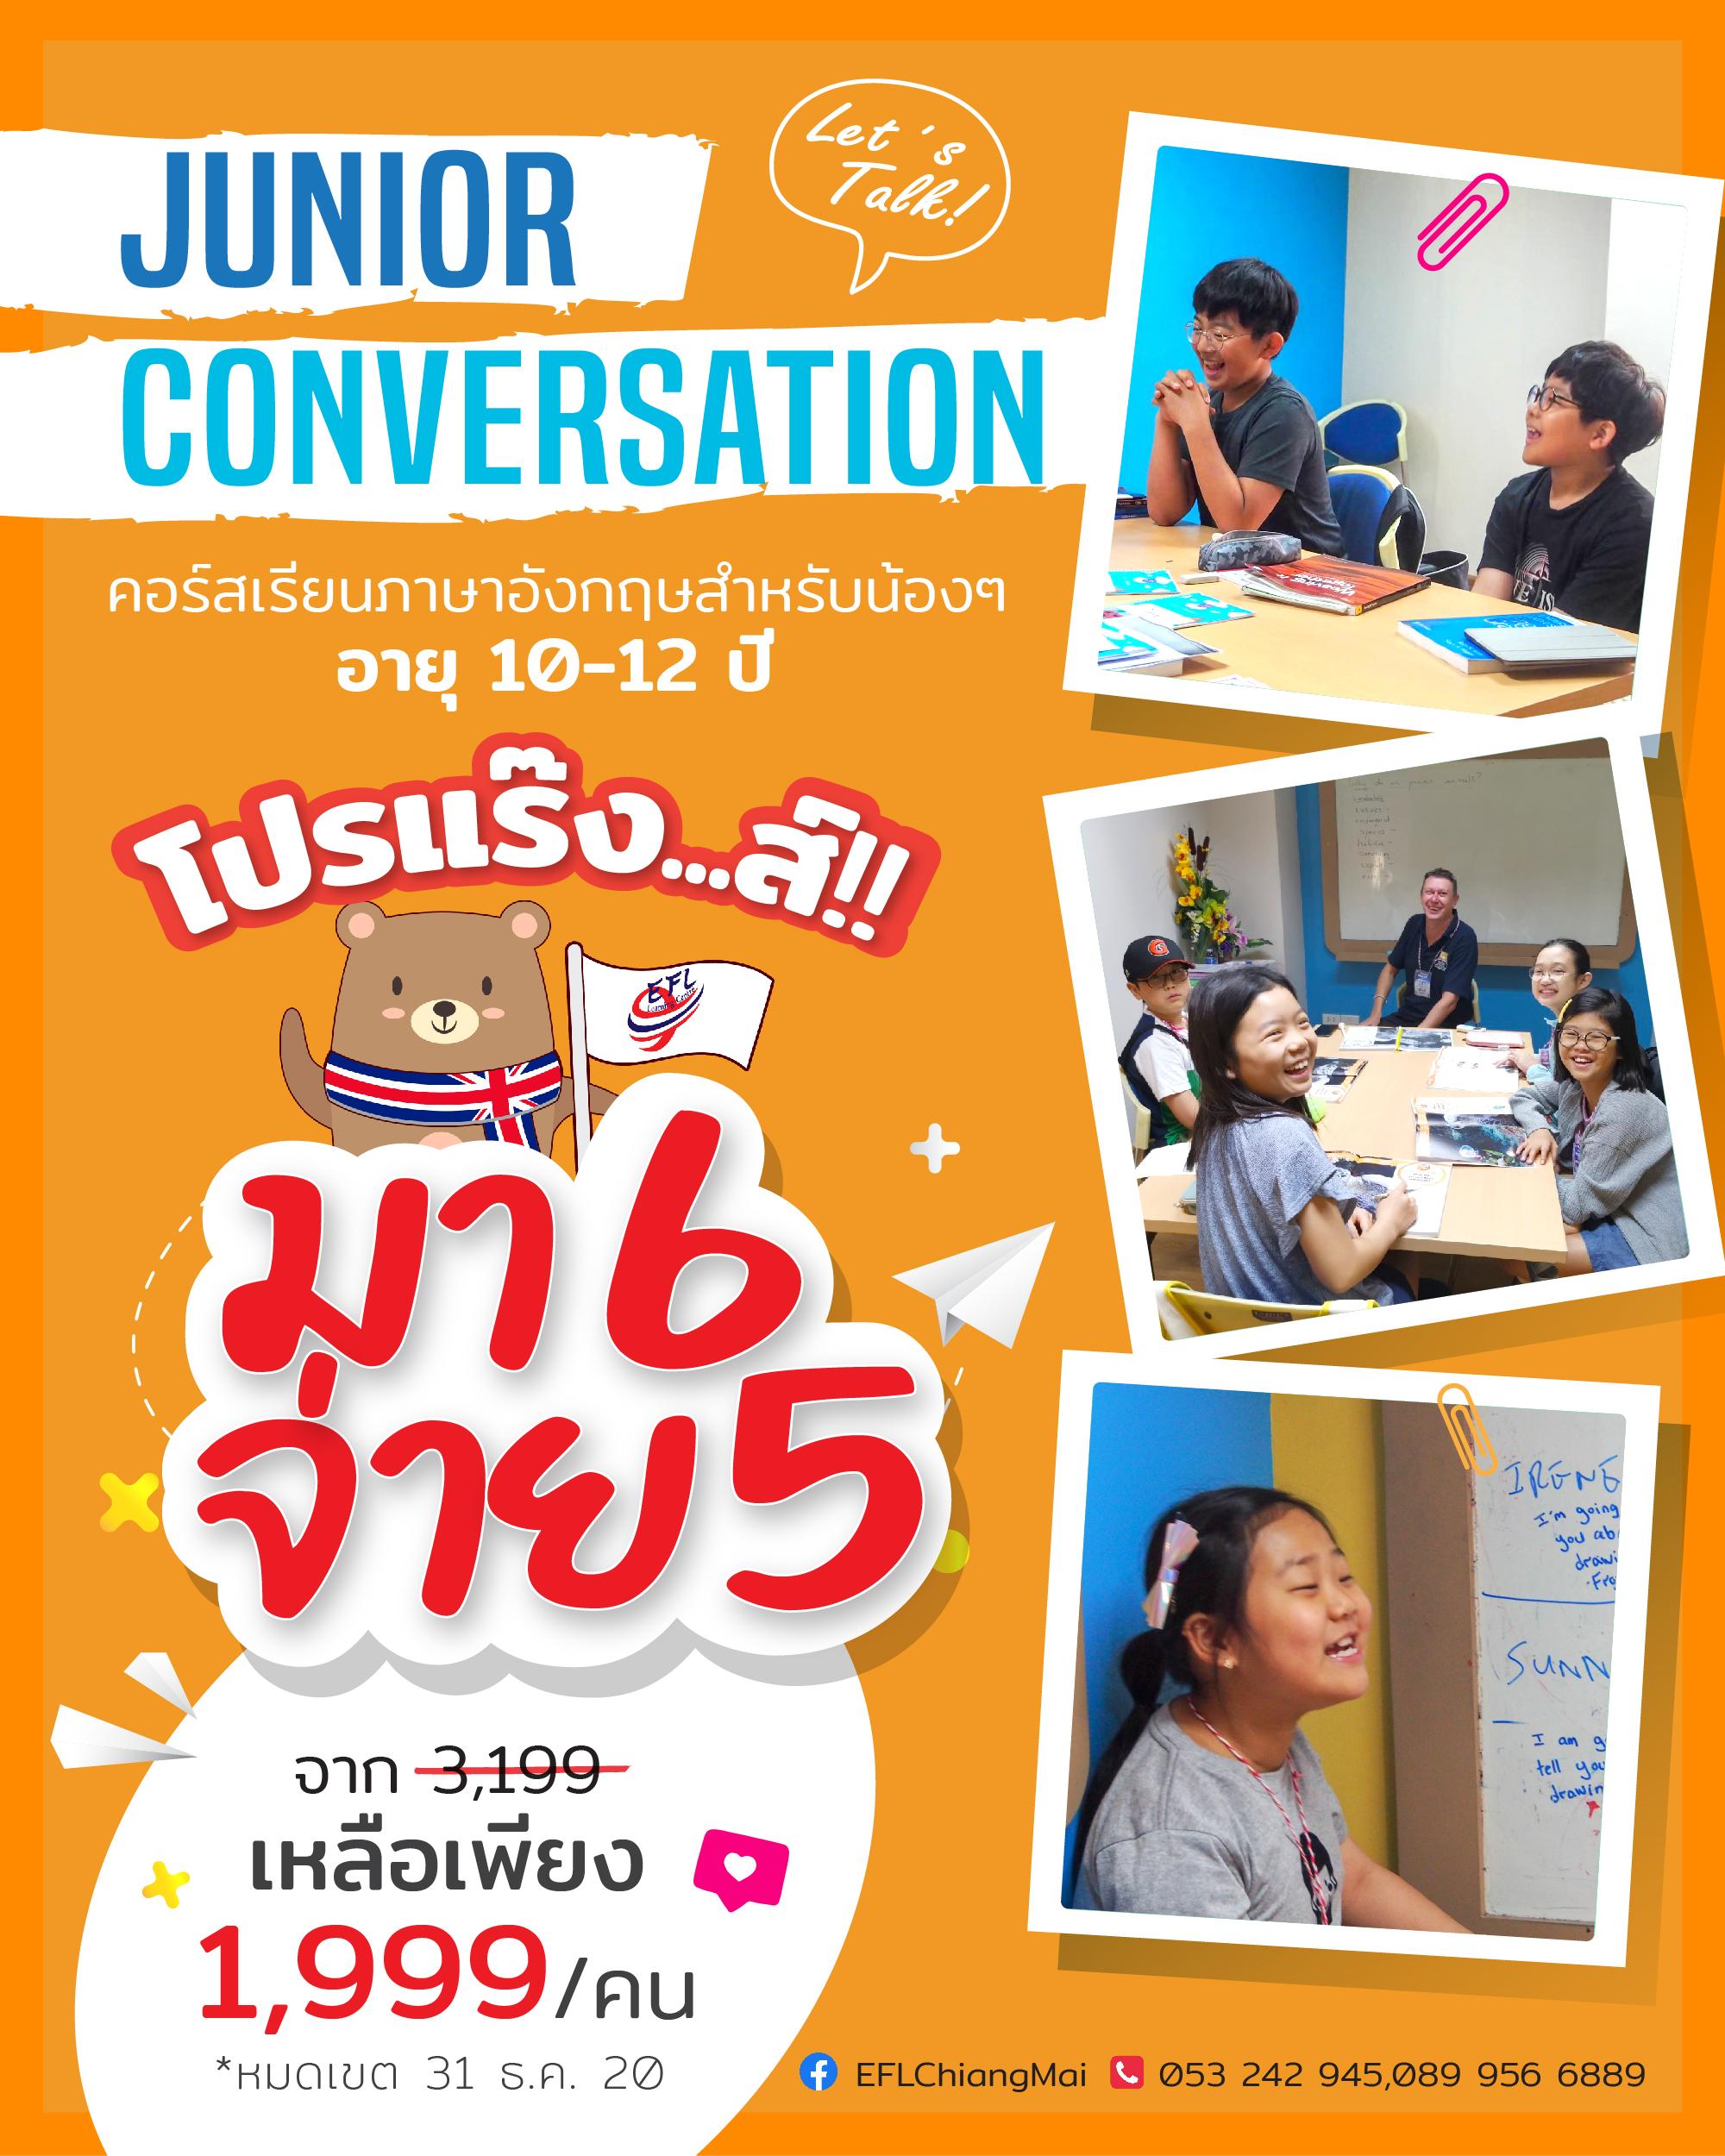 Junior Conversation !!!! มา 6 จ่าย 5